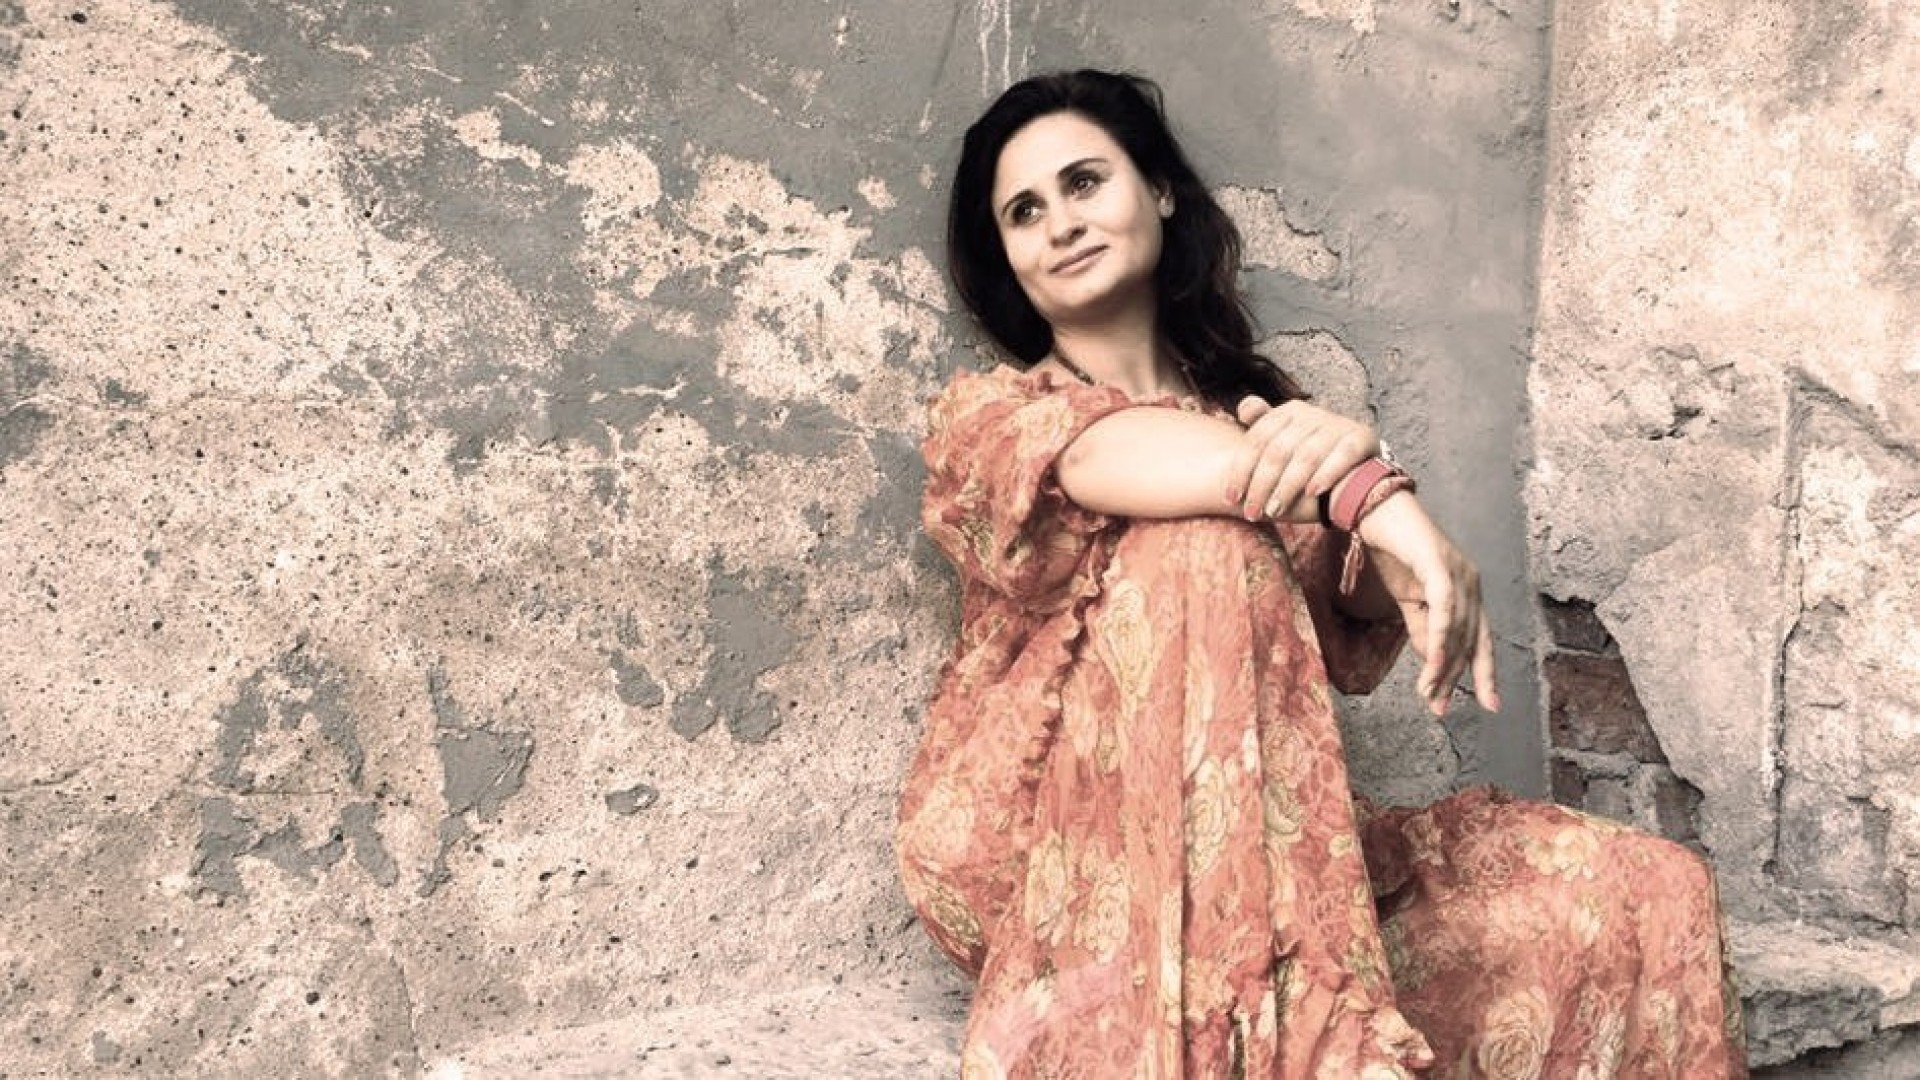 Сати Мата Джи: «Моя жизнь – это йога, йога – это моя жизнь»